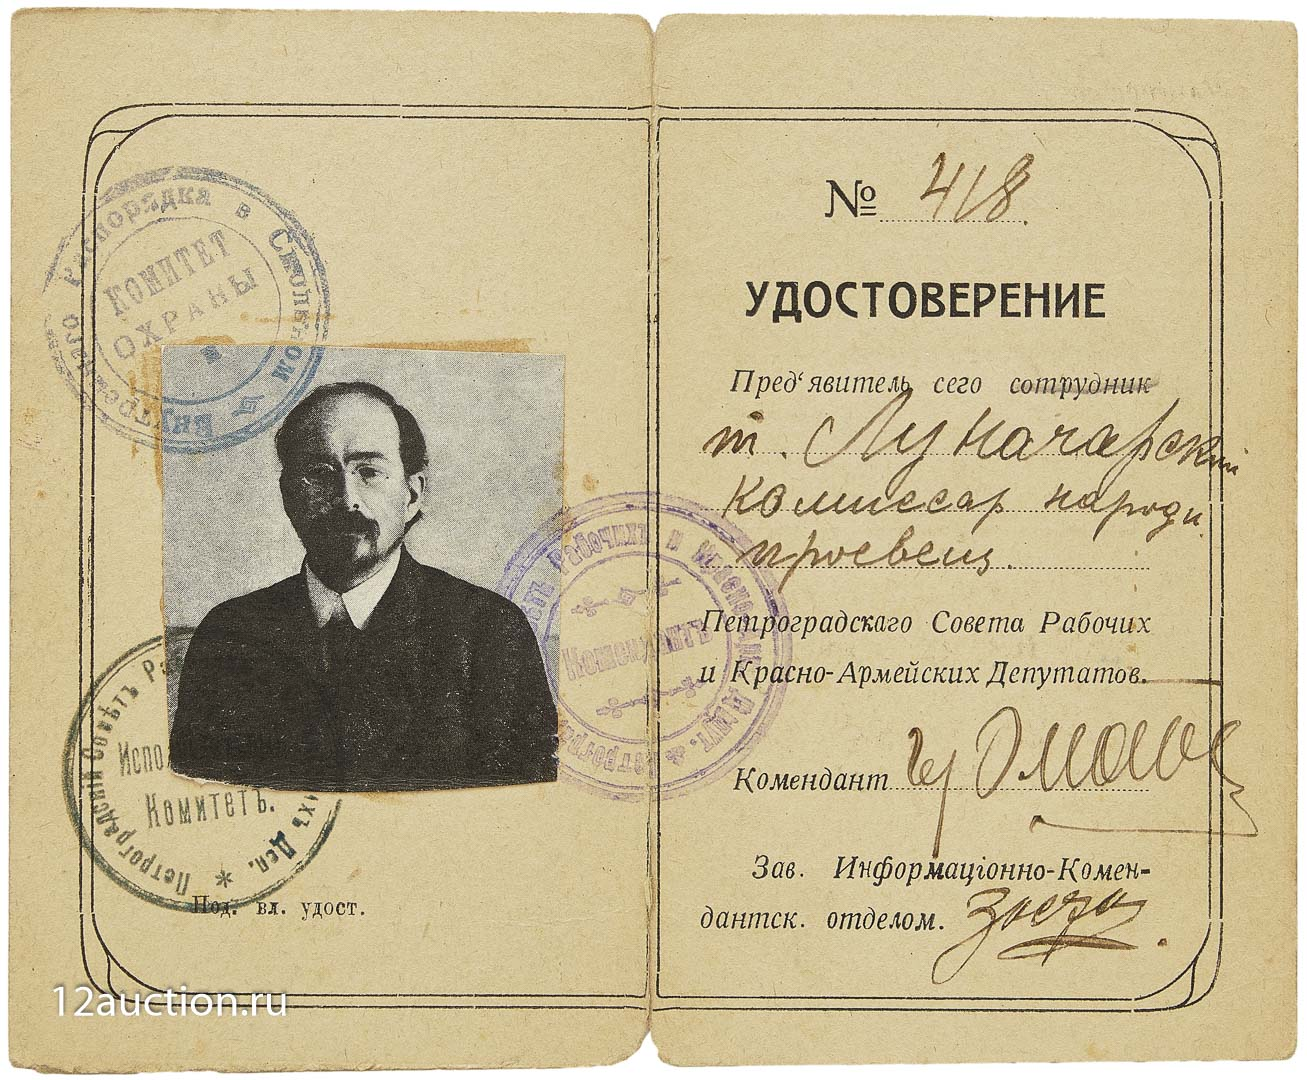 Архив с документами Анатолия Луначарского продан на аукционе